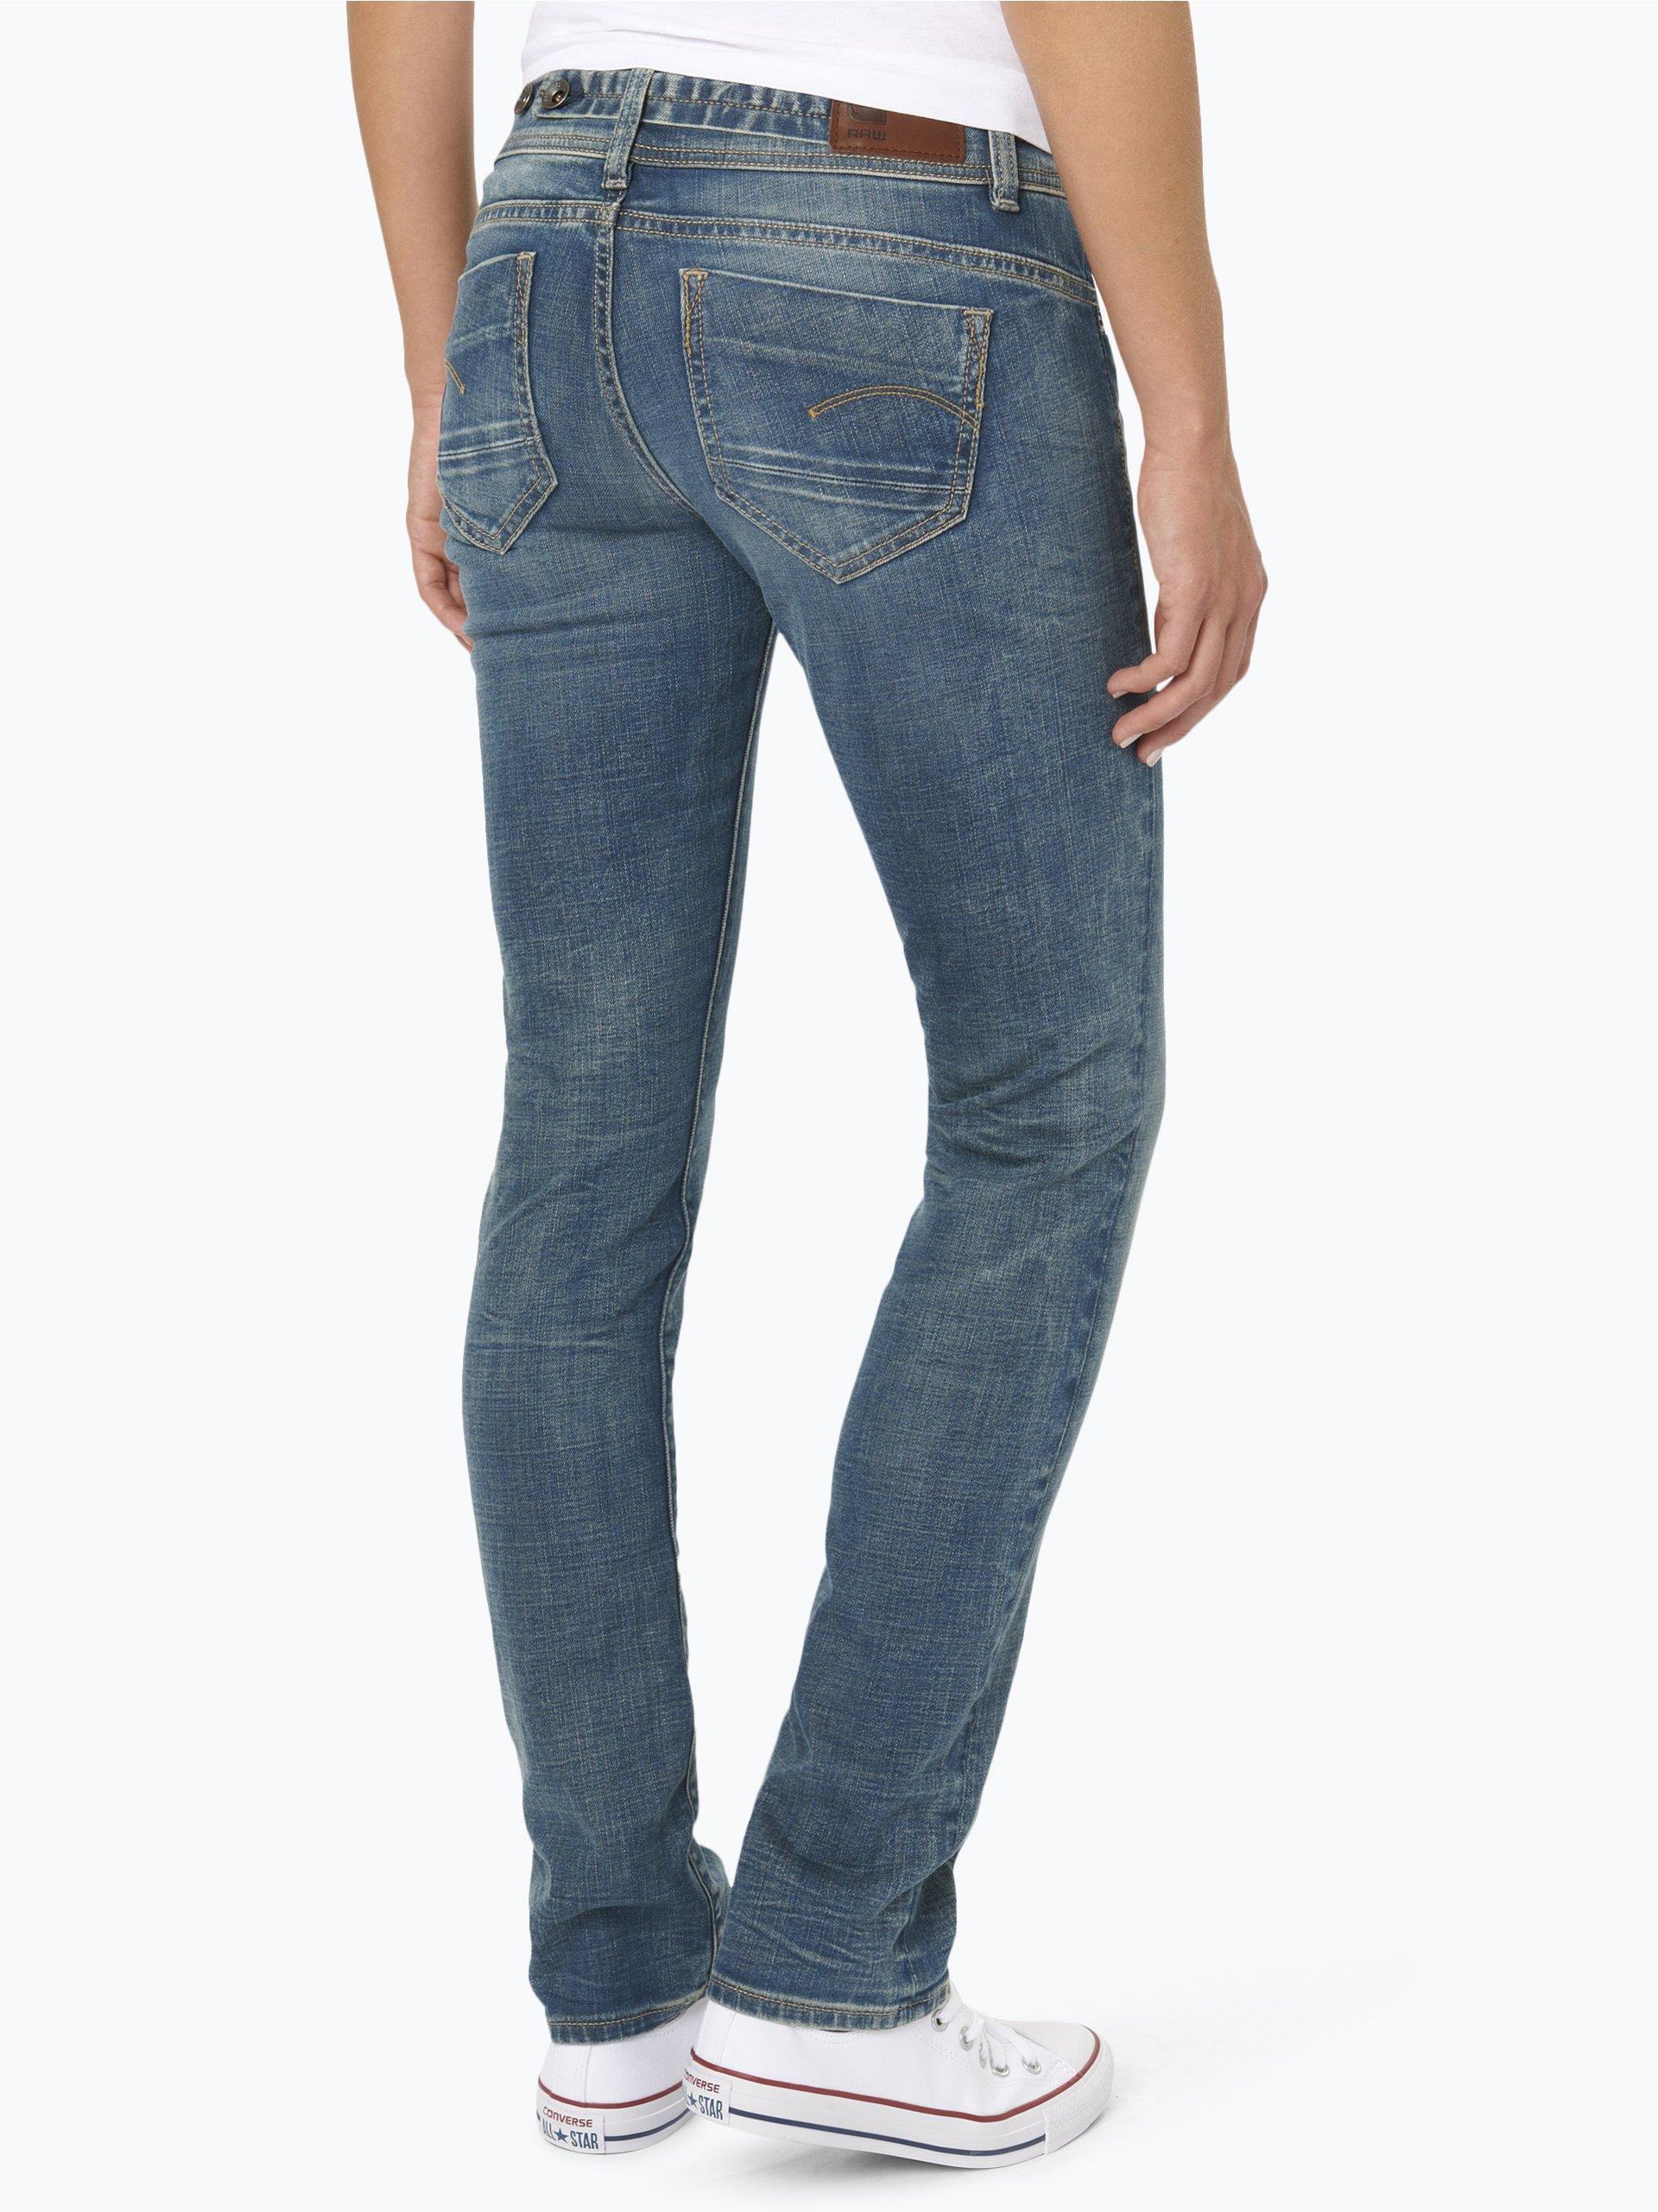 g star damen jeans midge blau uni online kaufen. Black Bedroom Furniture Sets. Home Design Ideas